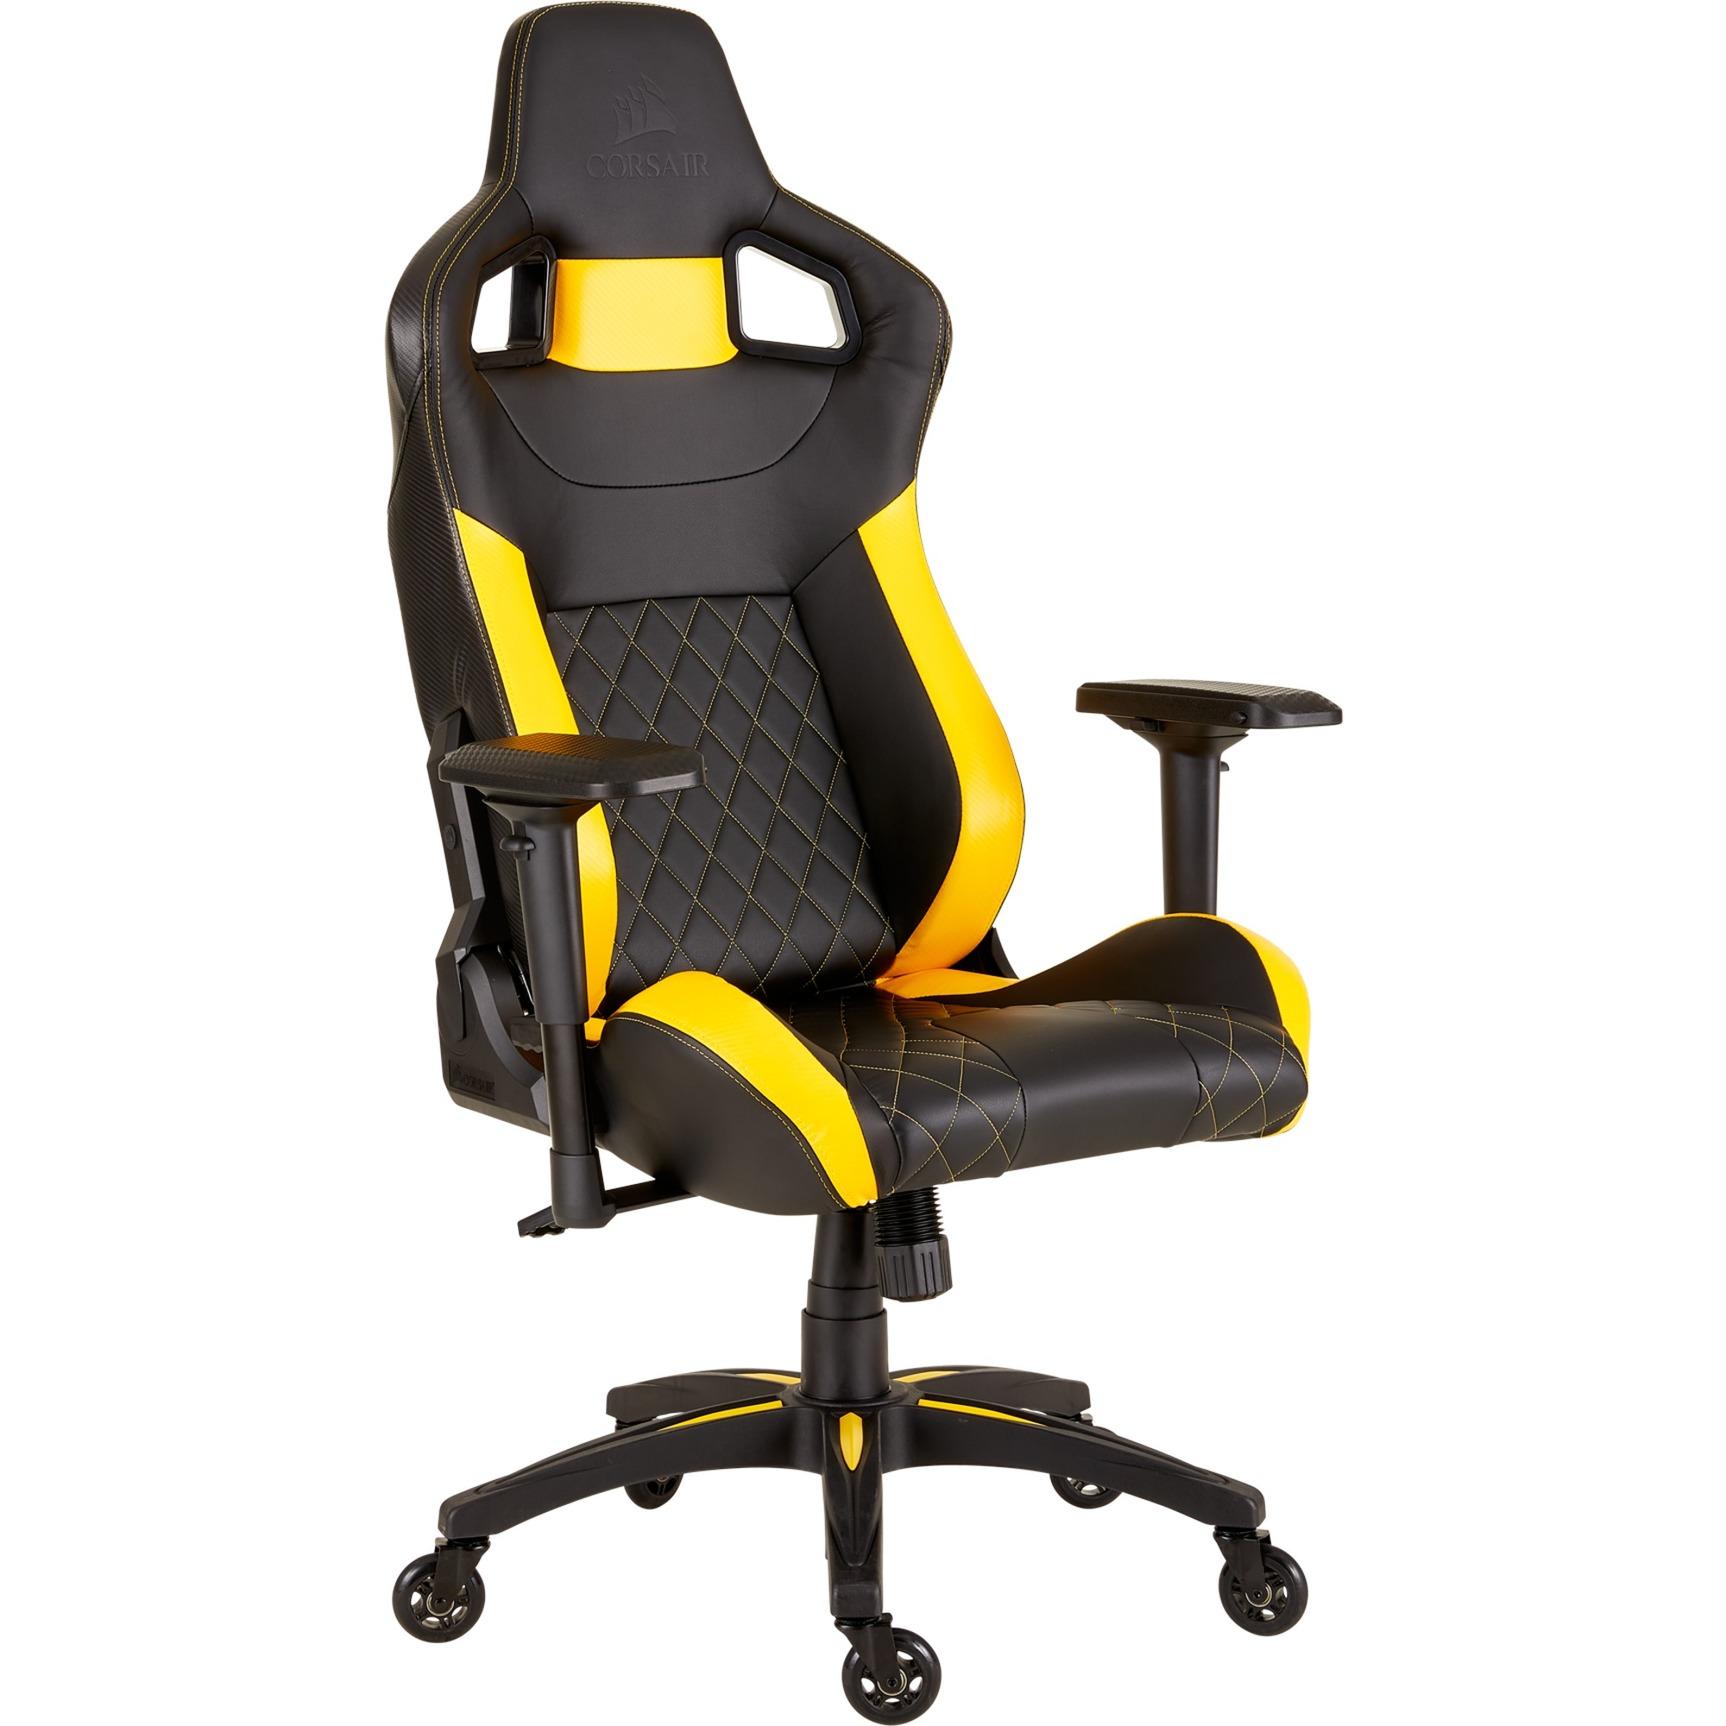 Race T1 T1 Gaming ChairStuhlschwarzgelb Race 2018 hsCxQrtdBo